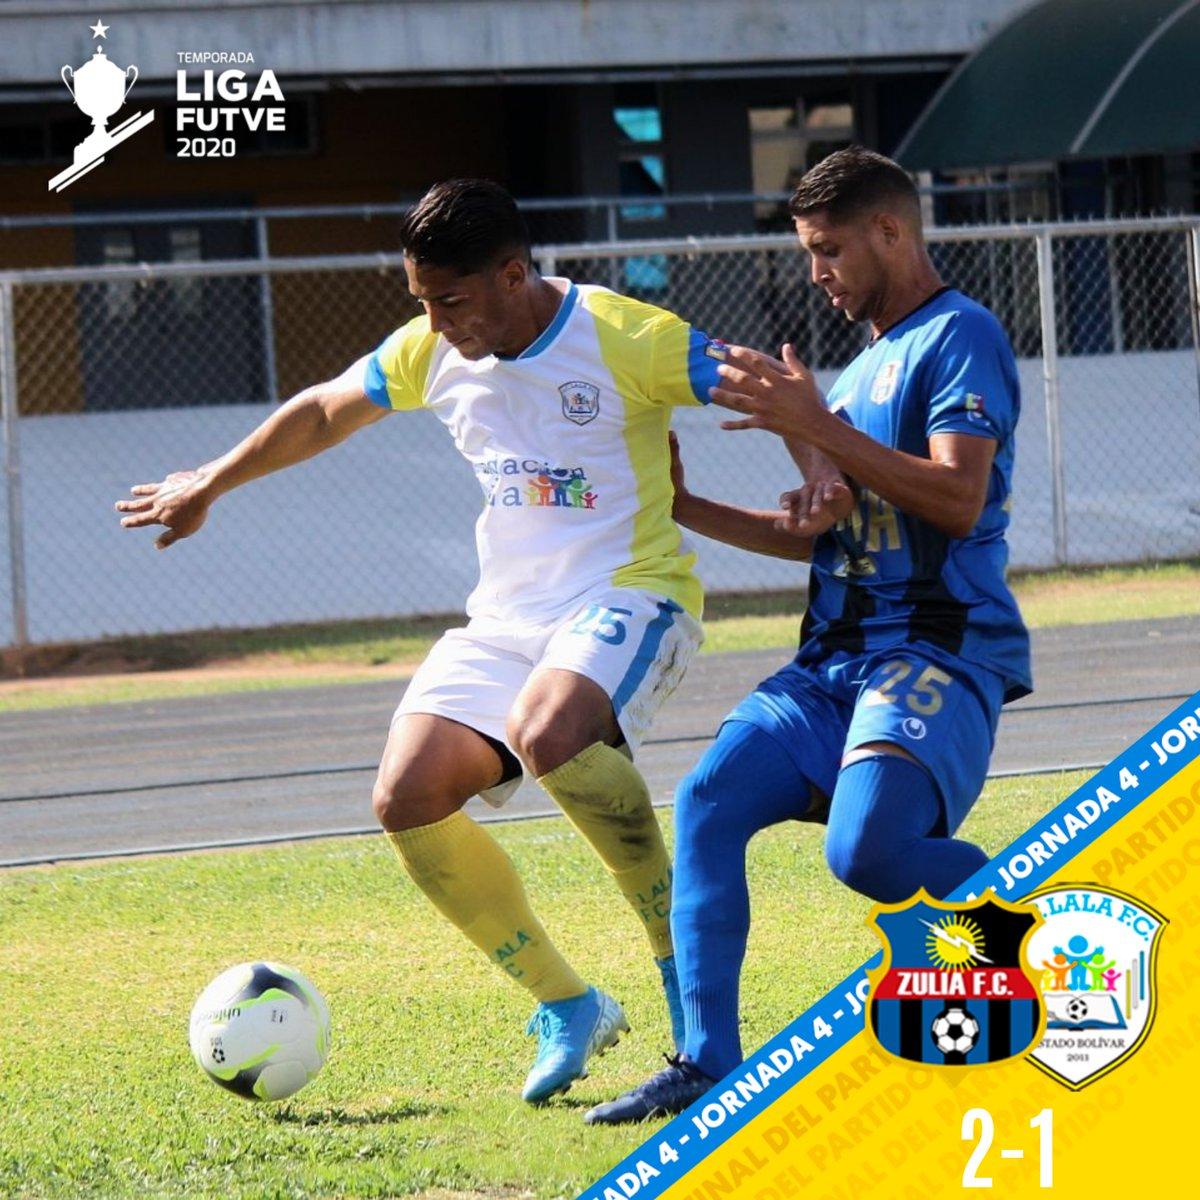 FT: @Zulia_FC 2-1 @LalaFutbolClub  Carlos Salazar 5' y Yanowsky Reyes 18' (ZUL); José Rondón 27' (LFC) #LigaFUTVE #FUTVExMTV pic.twitter.com/ycs1mMFo0m